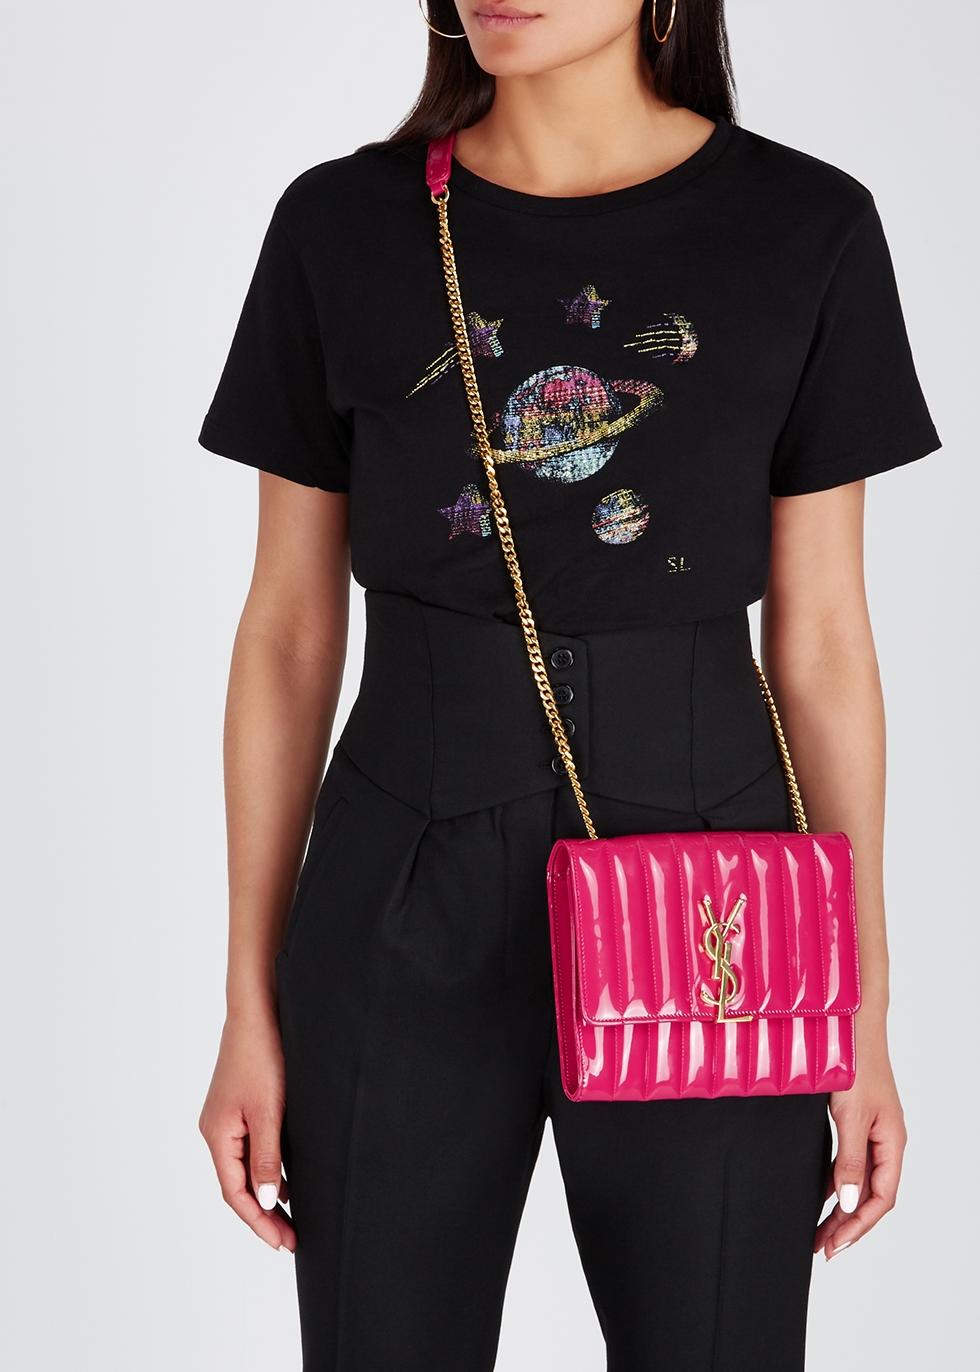 Vicky hot pink cross-body bag - Saint Laurent